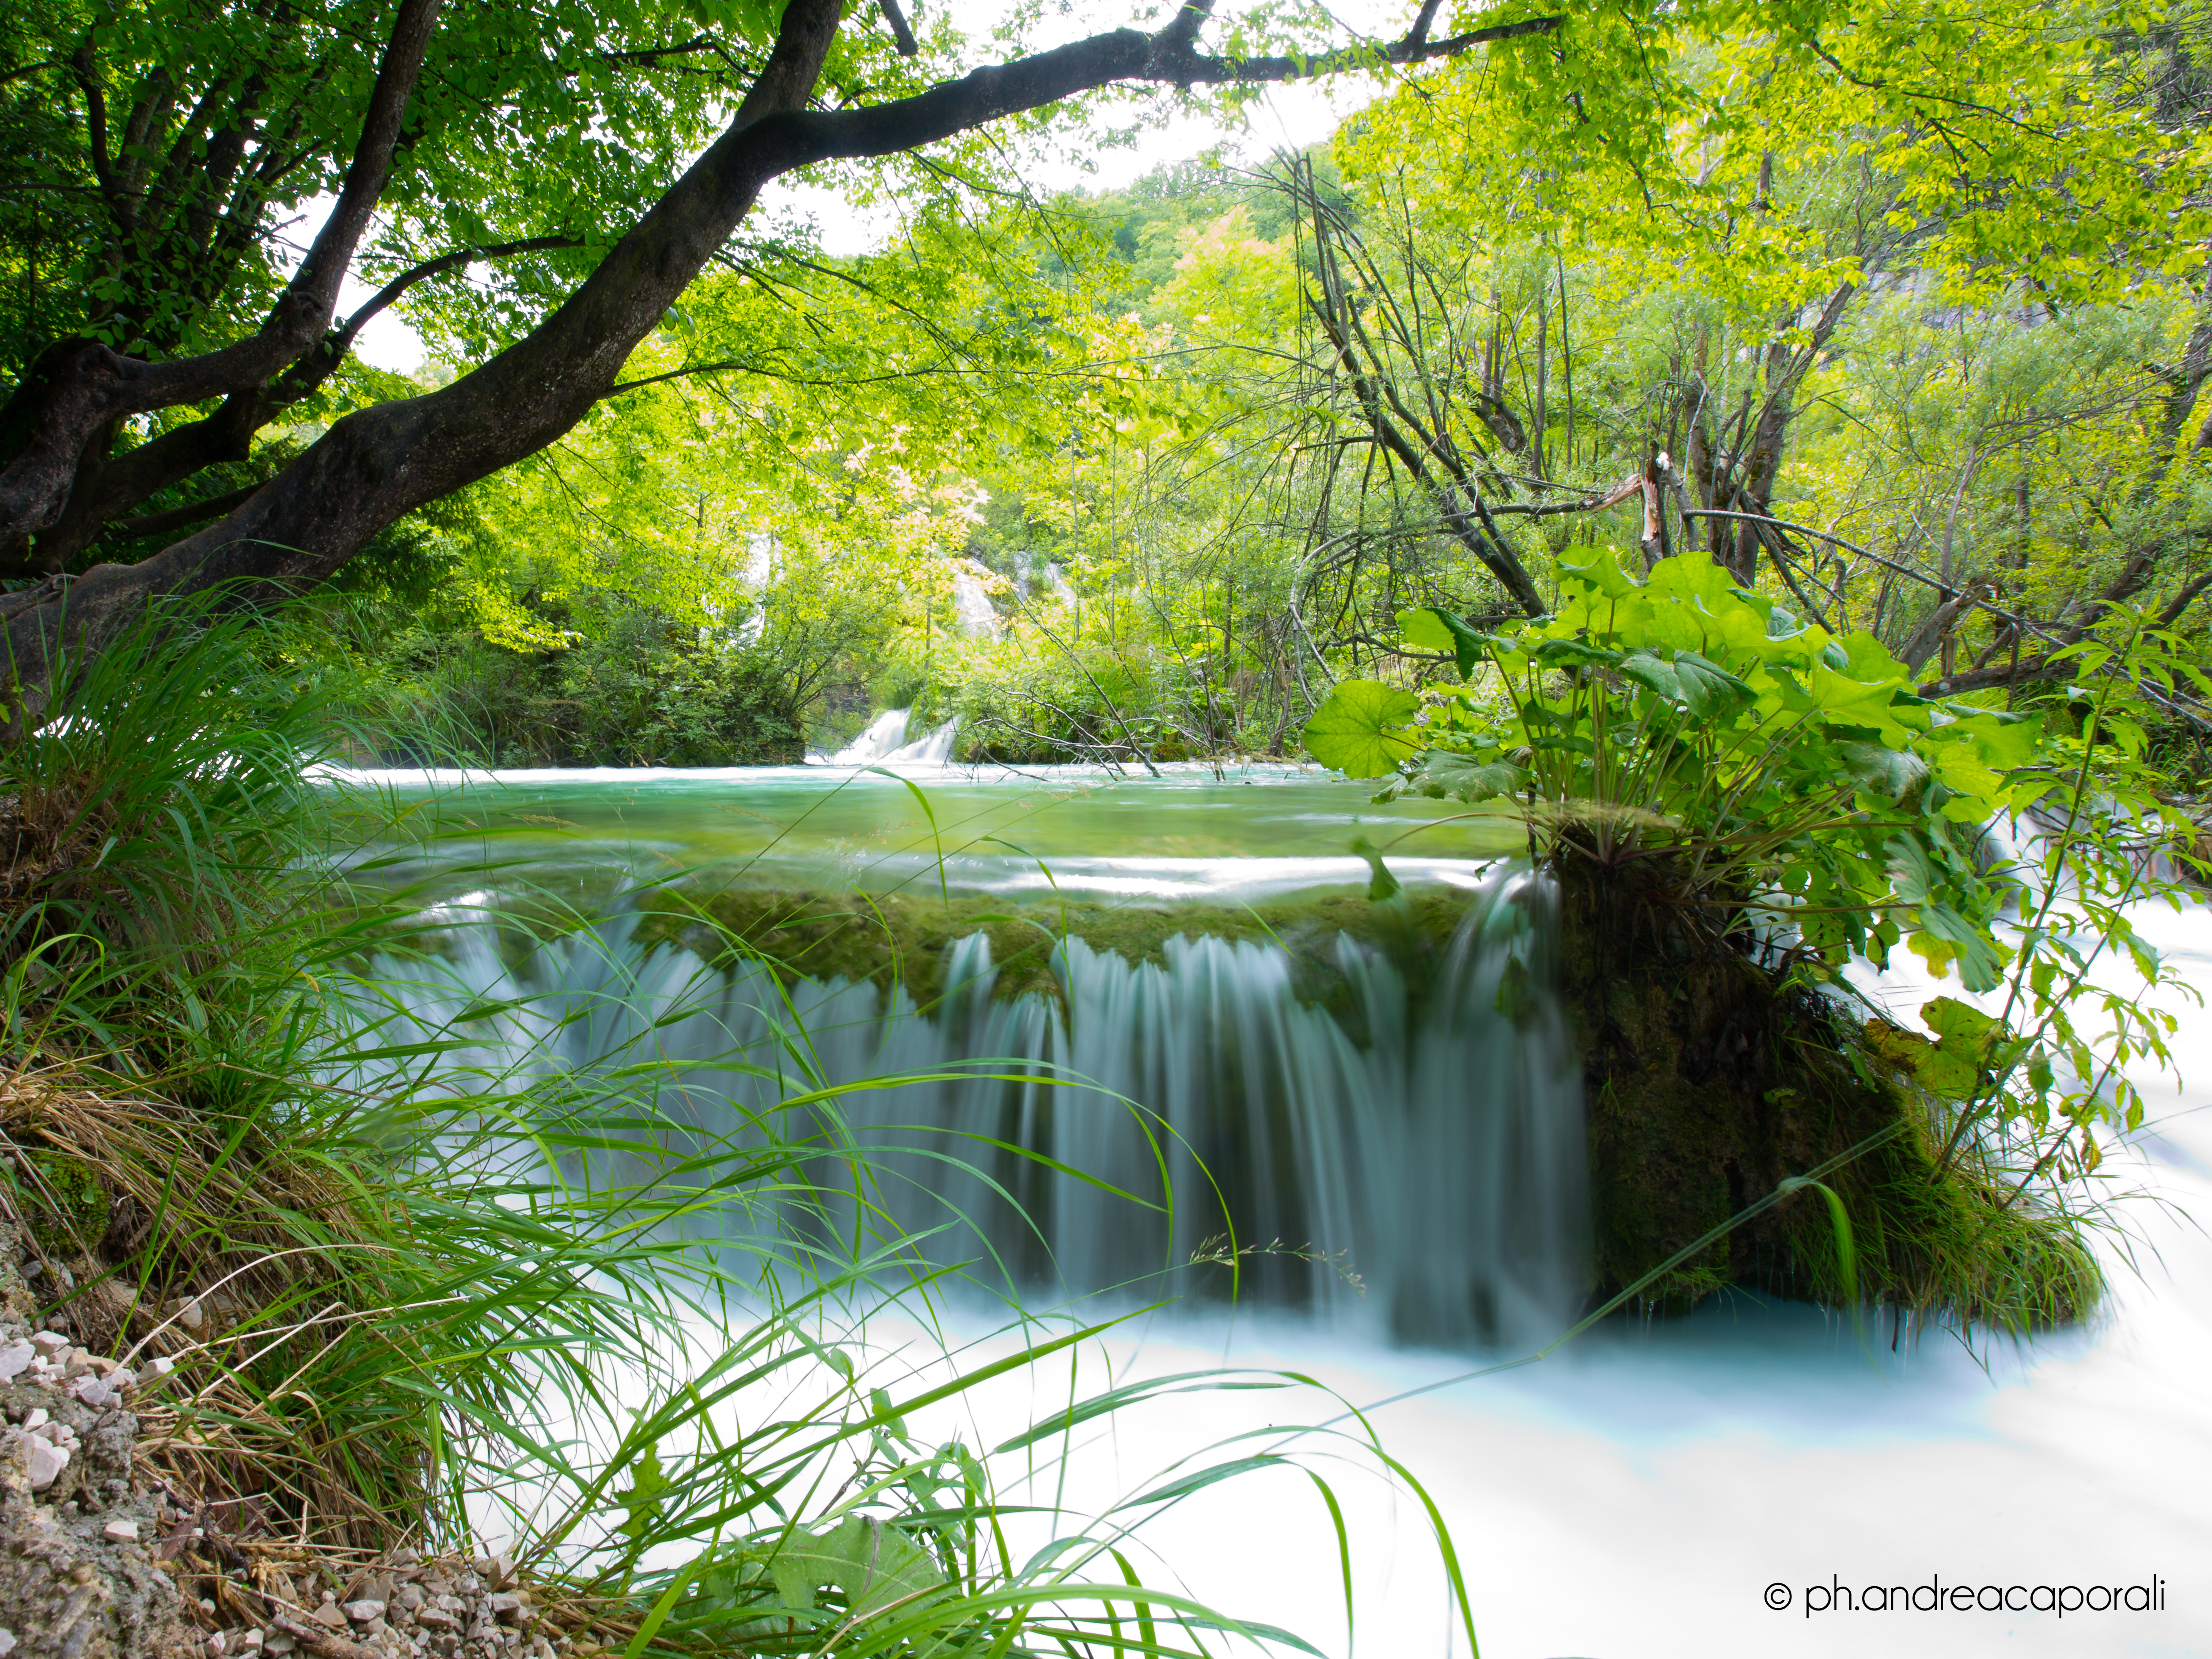 Croazia 2014 - Plitvice